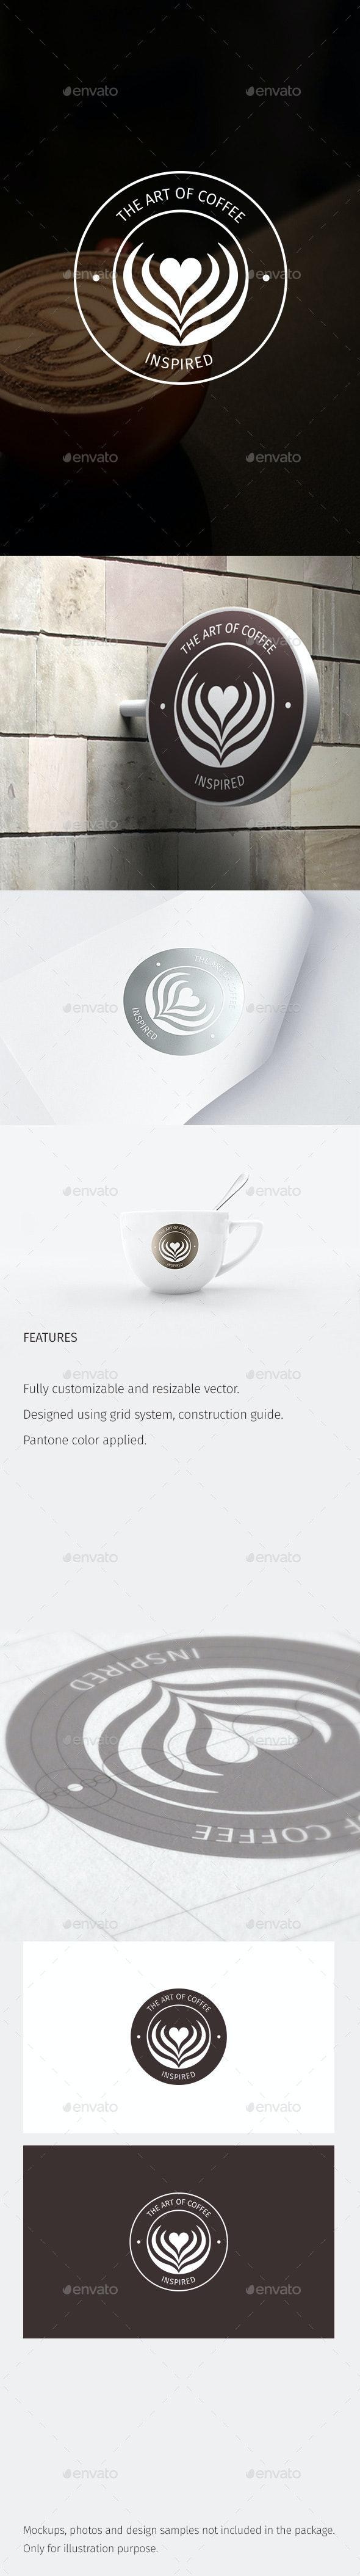 The Art of Coffee Logo